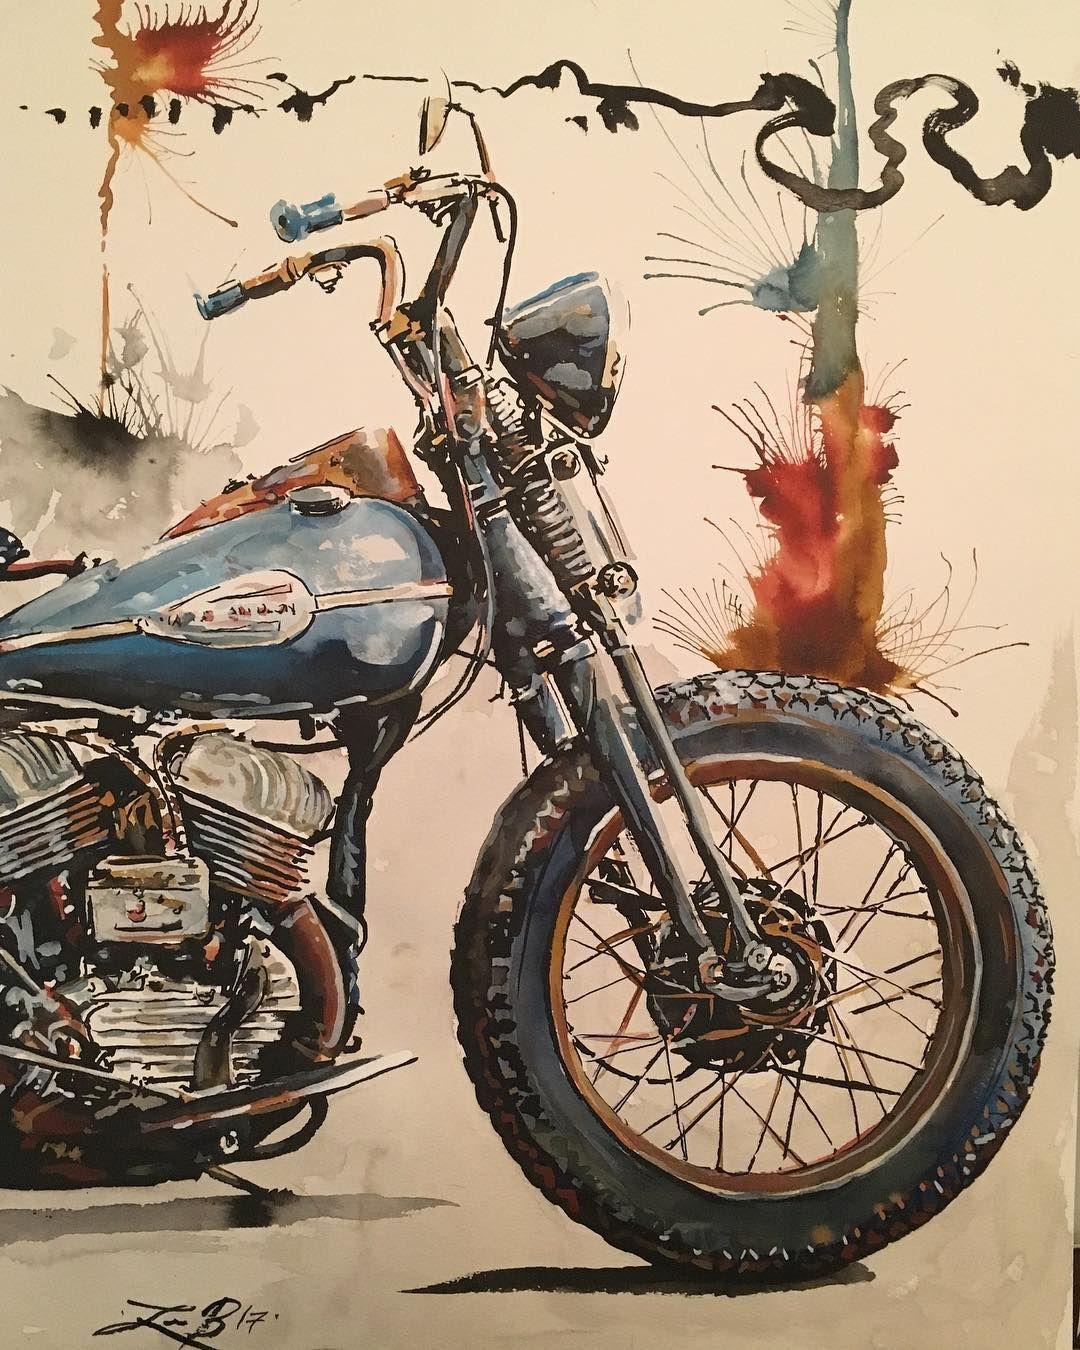 Badass Motorcycle Art By Leebullockart Motorcycle Artwork Motorcycle Art Bike Art